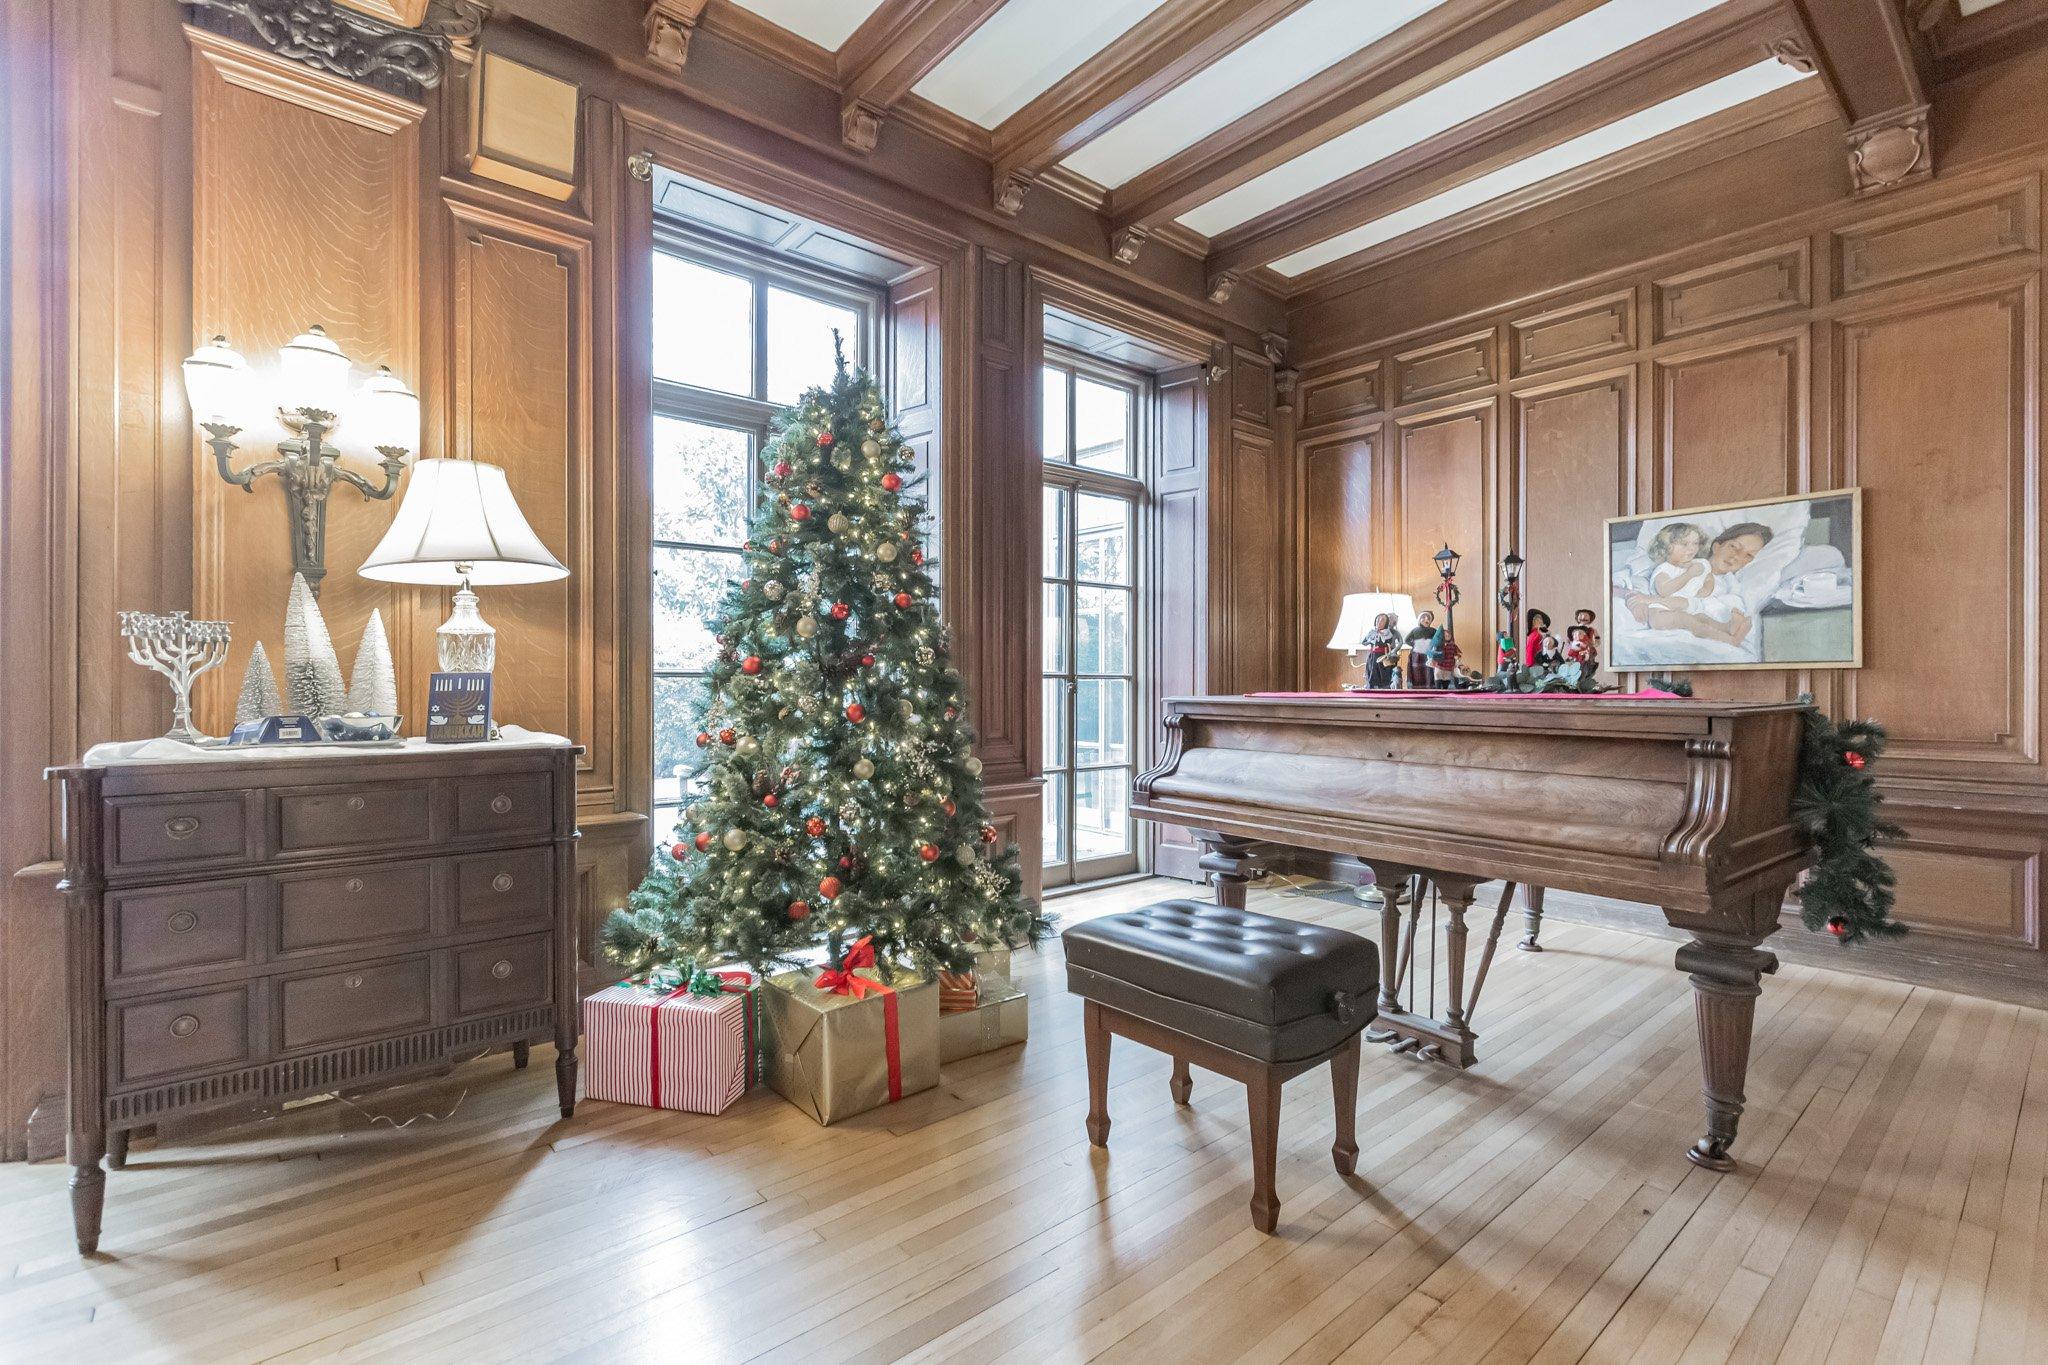 Piano and Christmas tree at The Mansion at Rosemont